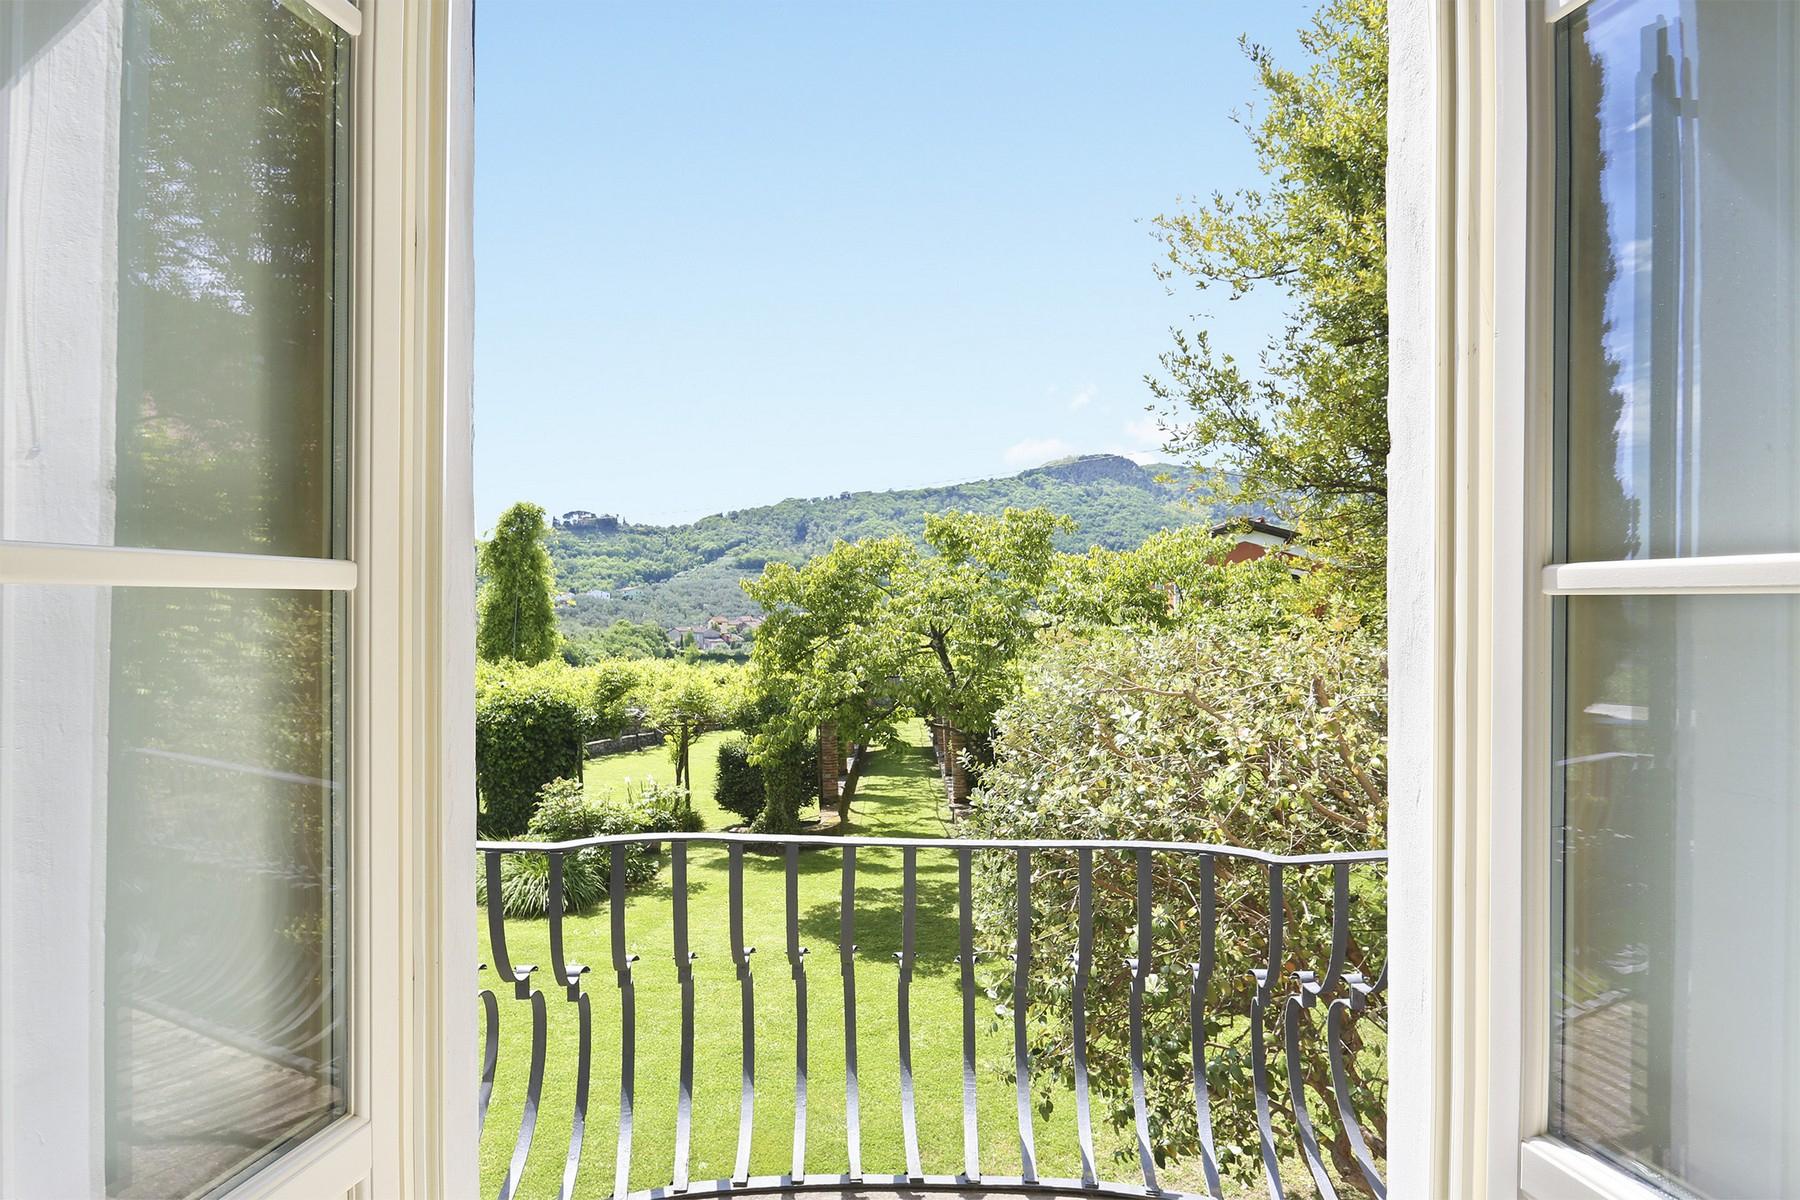 Villa in Vendita a Lucca: 5 locali, 735 mq - Foto 8